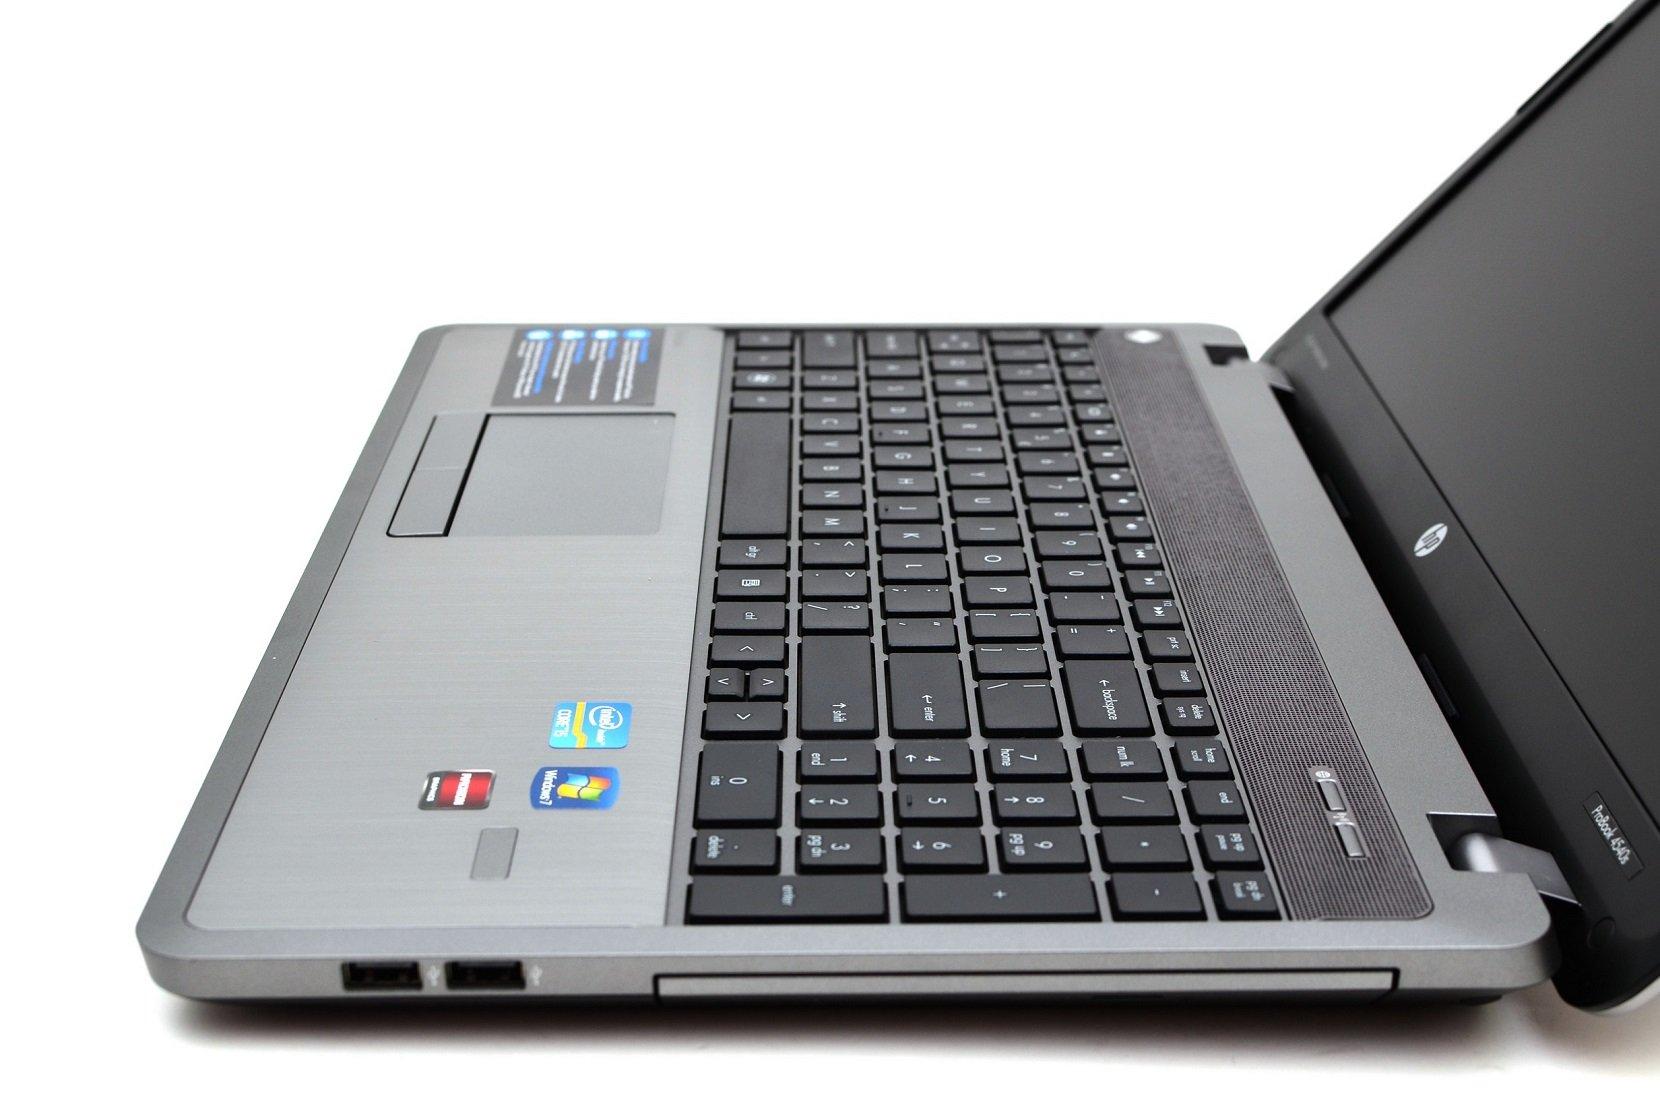 HP Probook 4540s-i5 3340M,RAM8,SSD128GB,VGA RỜI Màn 15.6 inch